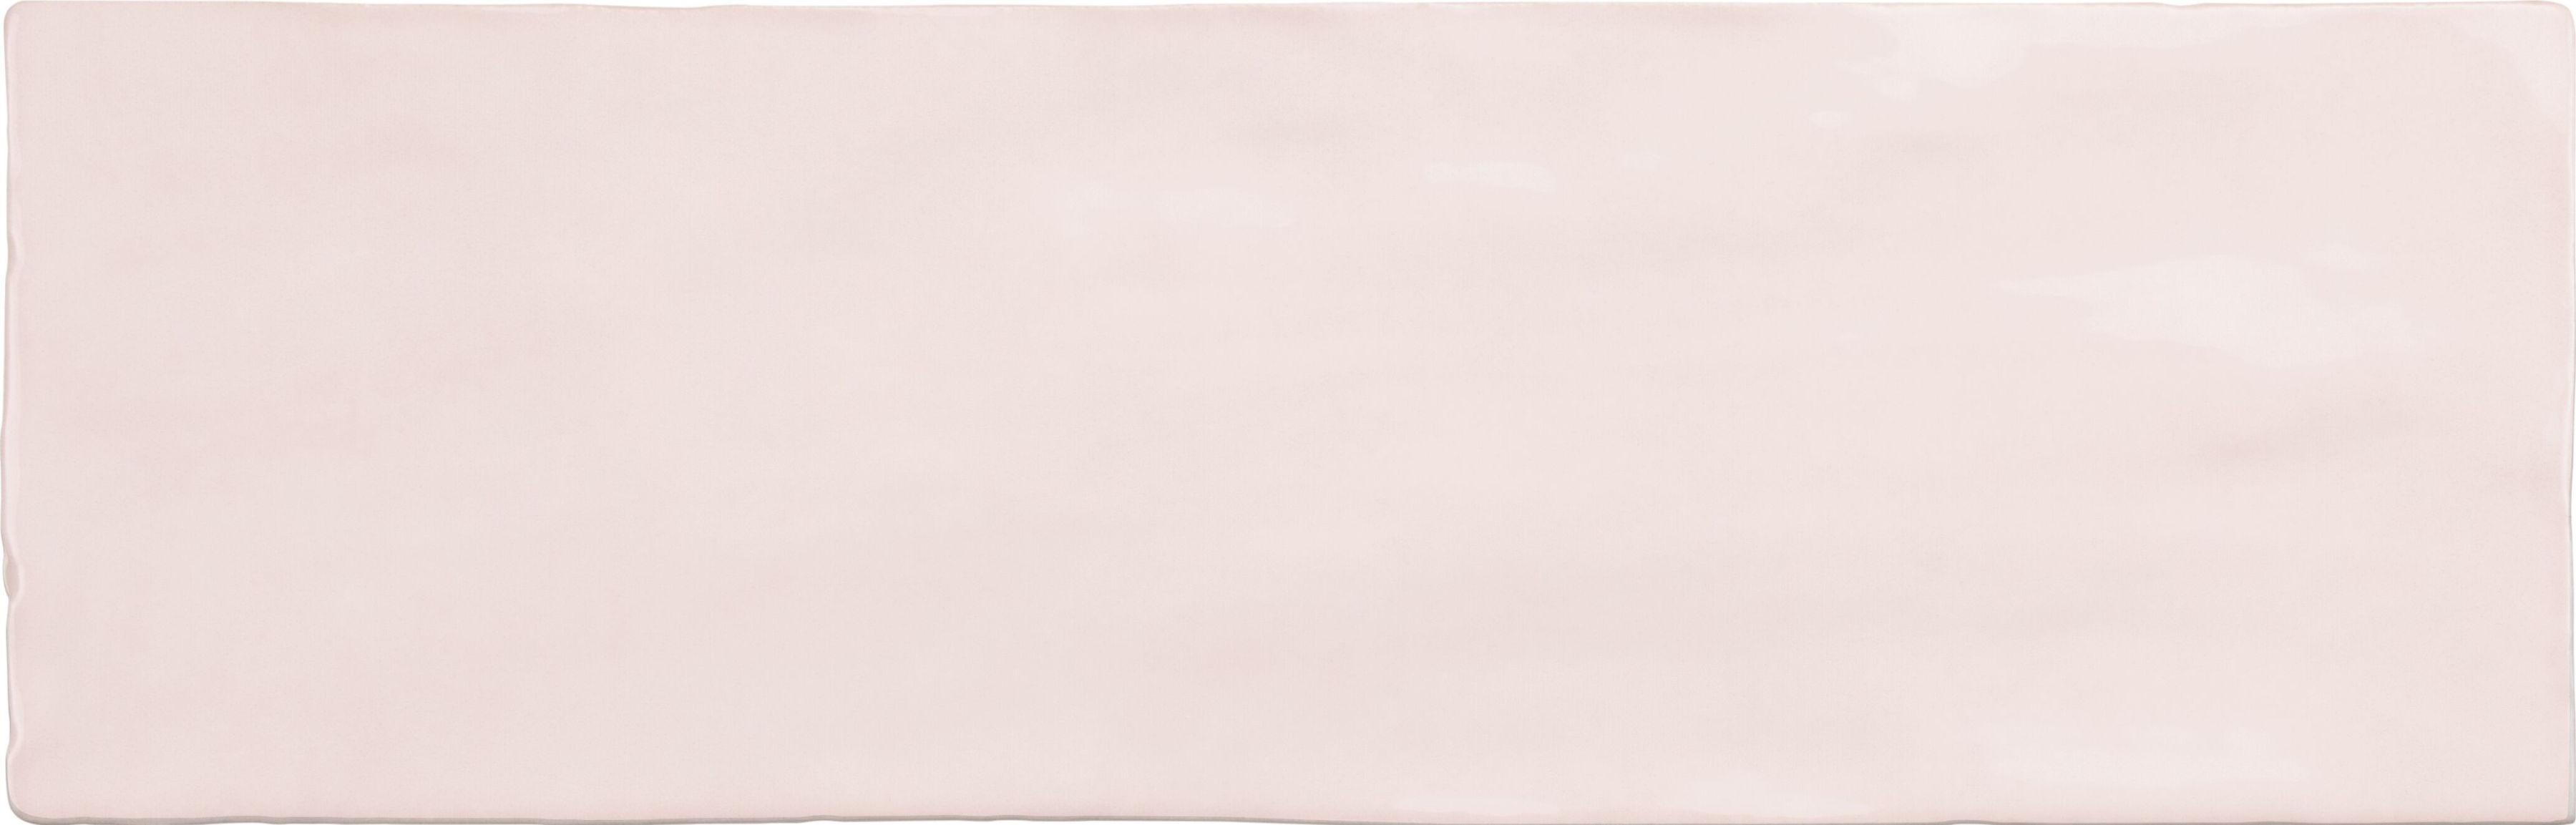 La Riviera Rose 6,5 x 20 płytki prostokąt